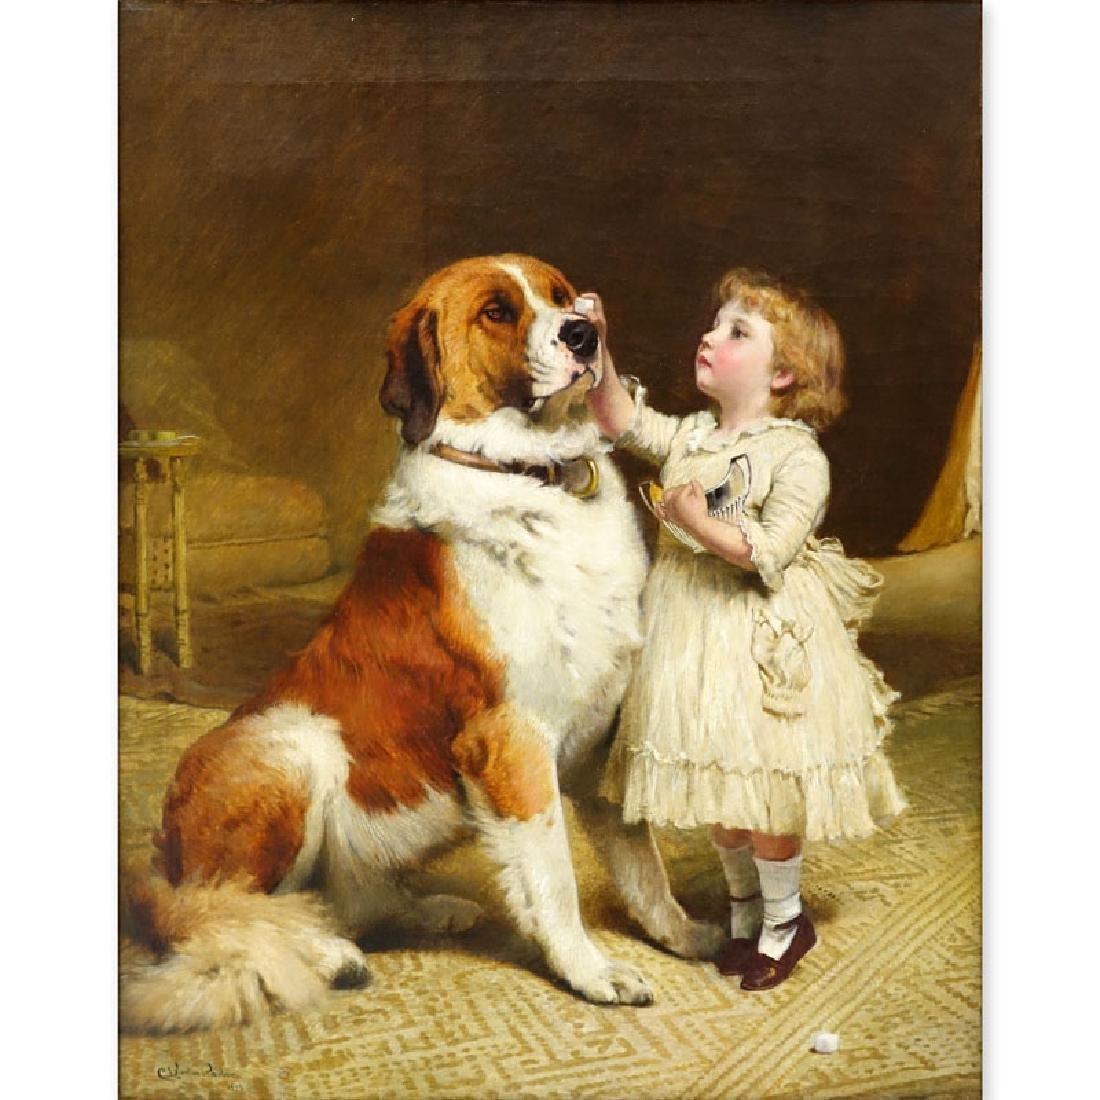 Charles Burton Barber, British (1845-1894) Oil on